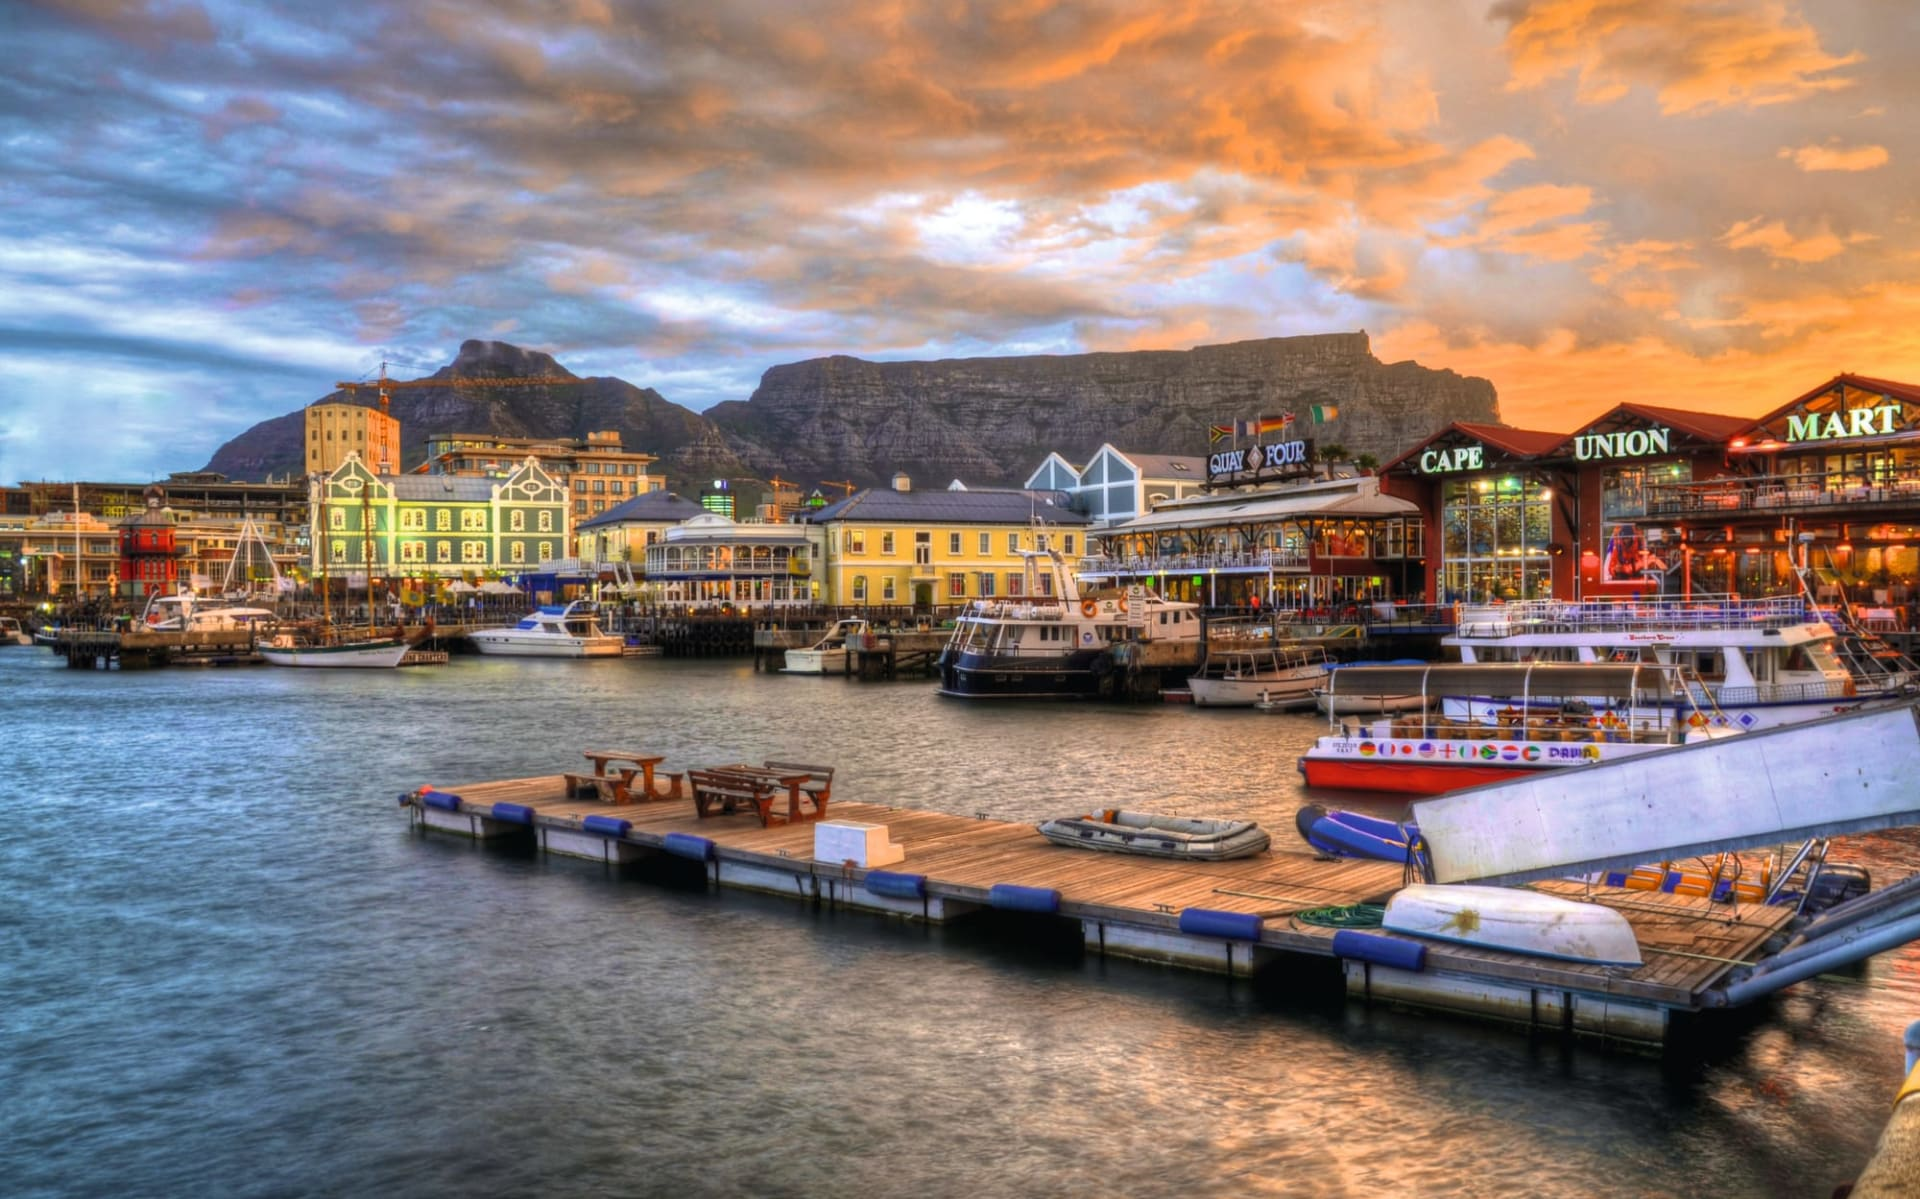 Victoria & Alfred Hotel in Kapstadt: stadt Kapstadt - Victoria&Alfred Waterfront bei Abenddämmerung c Fotolia_69440448_Subscription_Monthly_XL